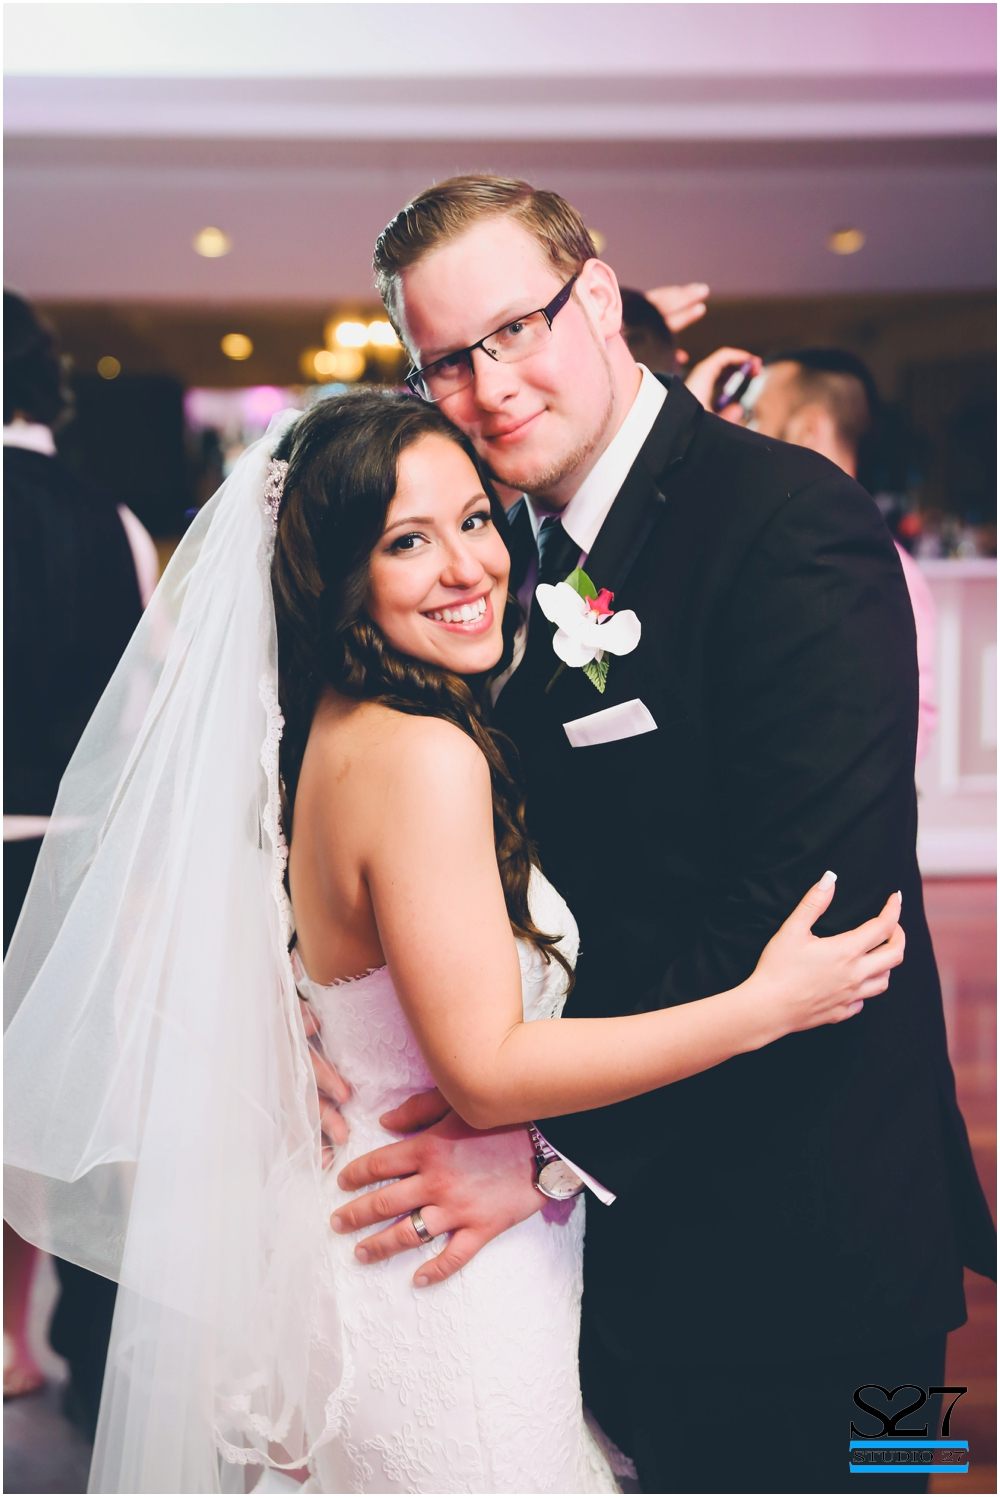 Somerley-Fox-Hollow-Wedding-Studio-27-Photo-WEB_0033.jpg